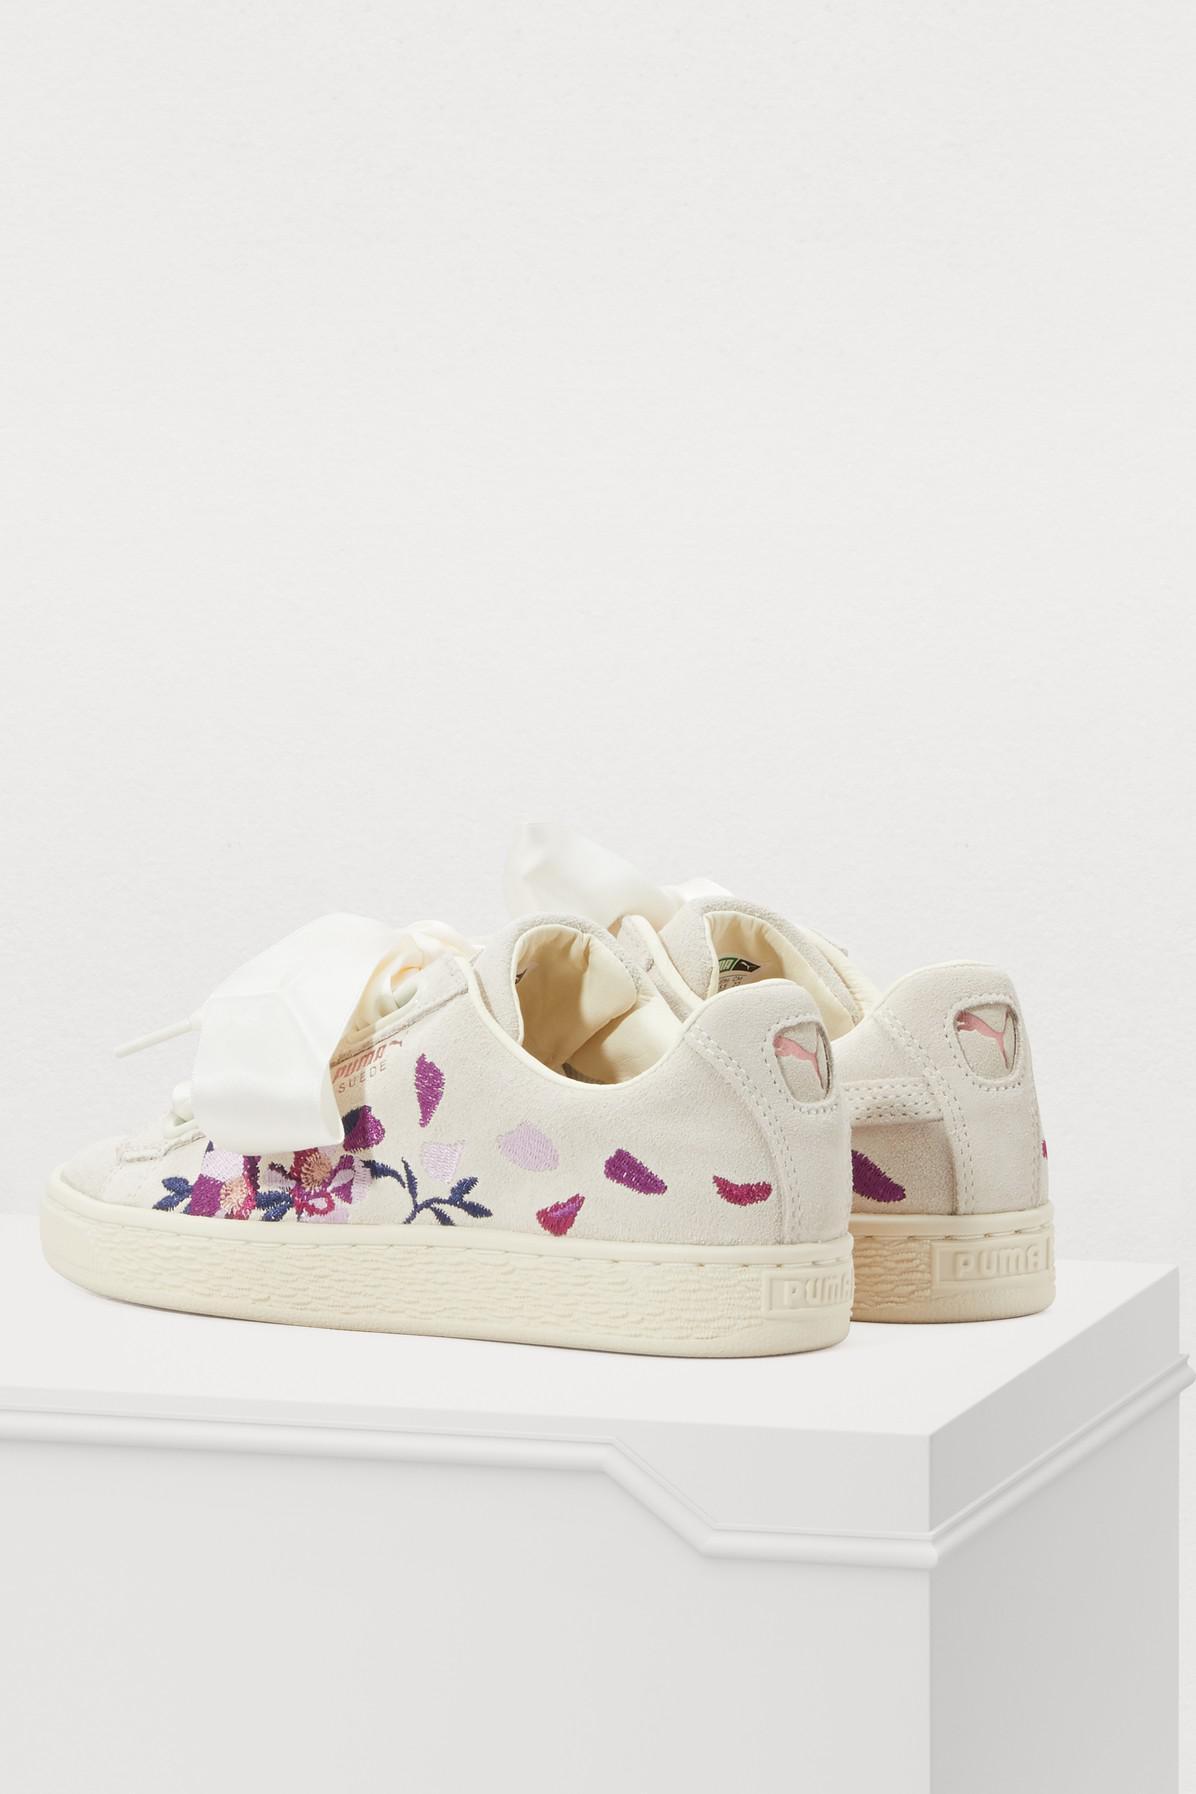 d073fae83a62 PUMA - White Heart Flower Sneakers - Lyst. View fullscreen